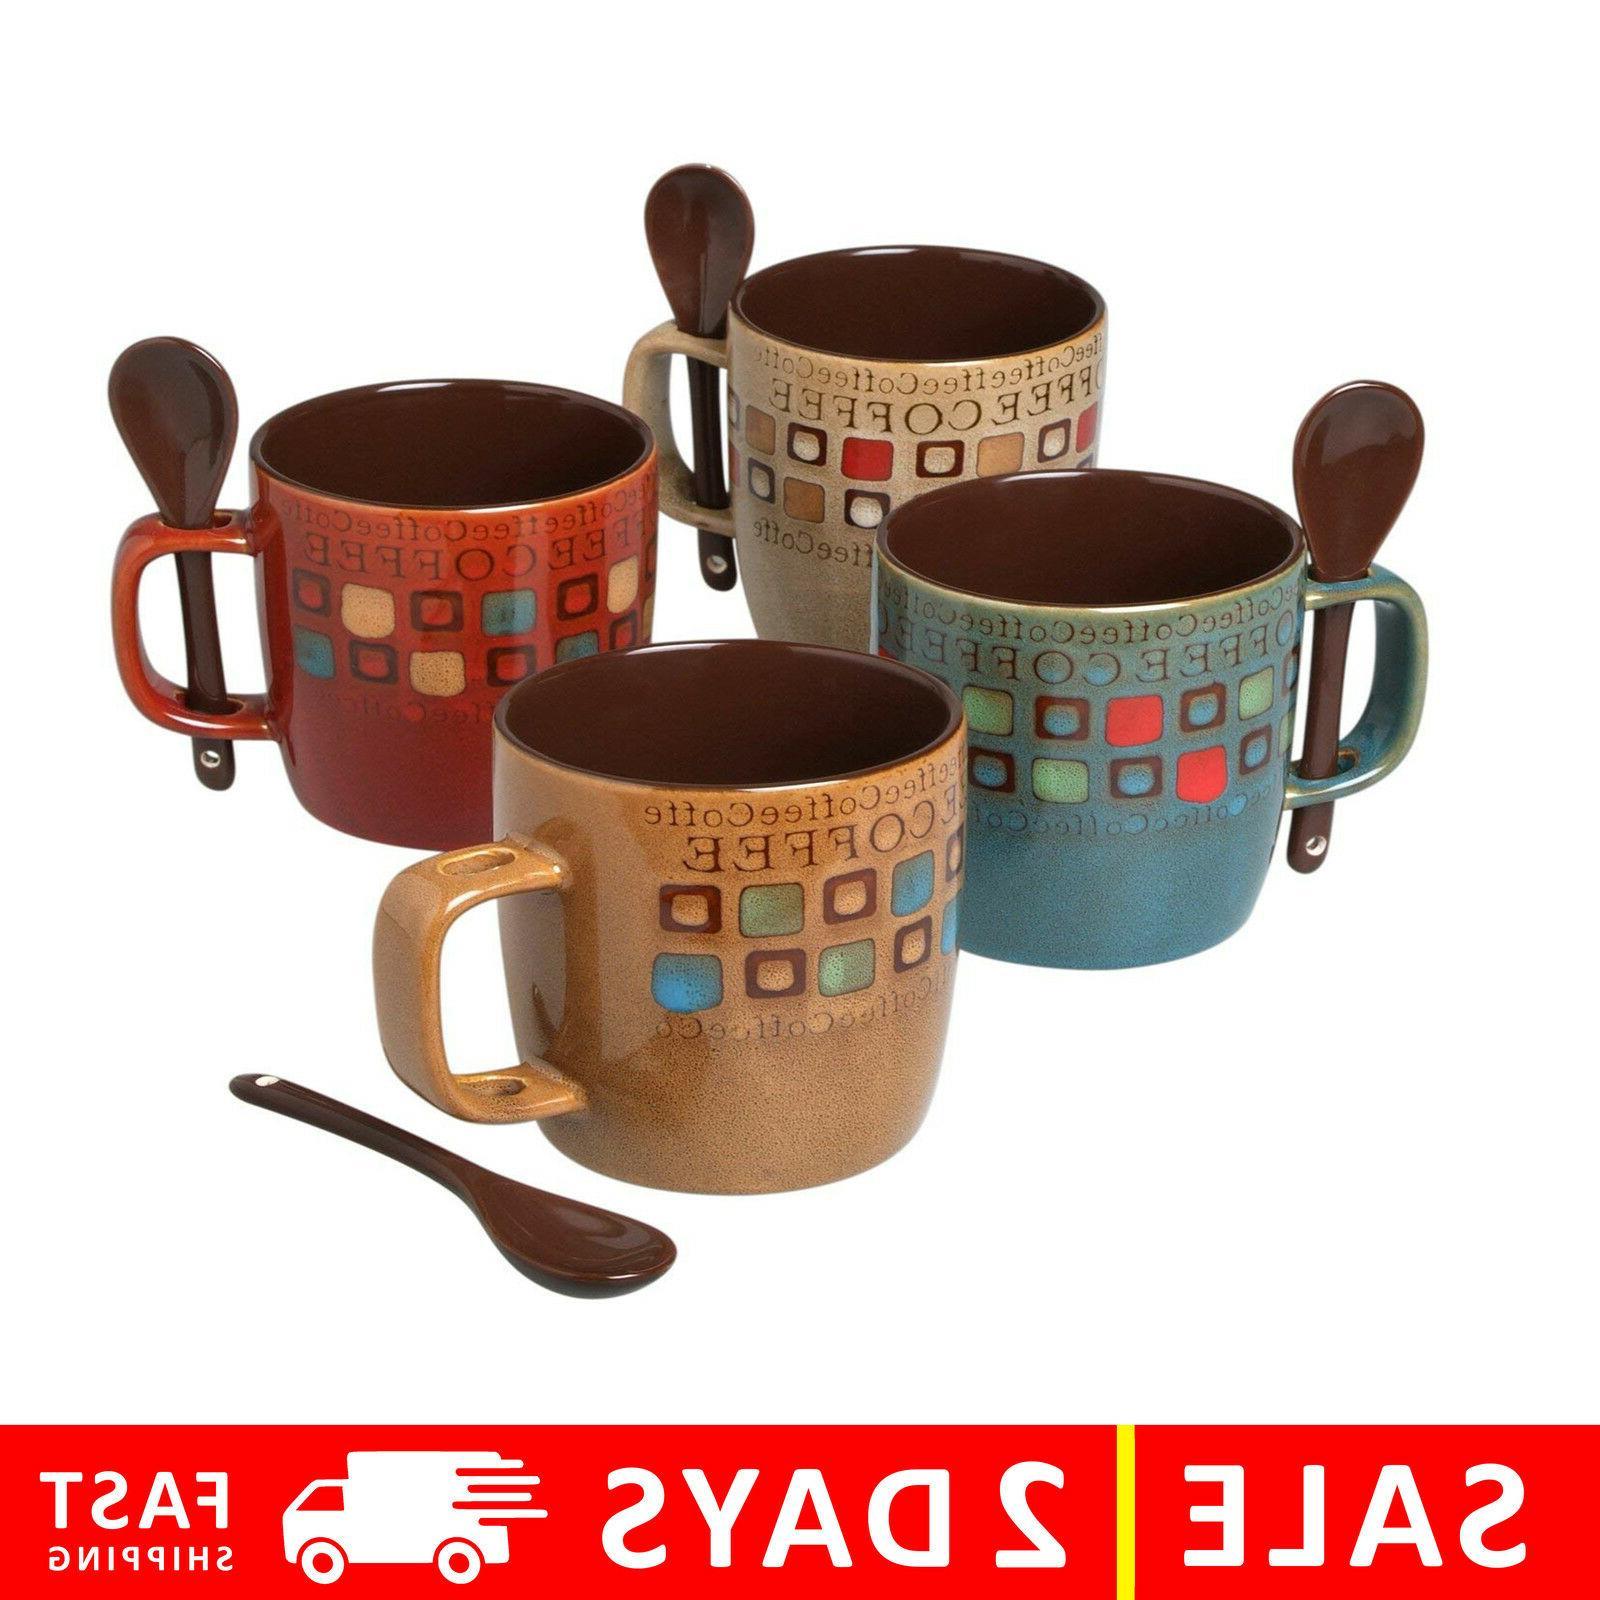 Americano Coffee Mug Spoon Tea Cup Ceramic Cafe Microwave Sa